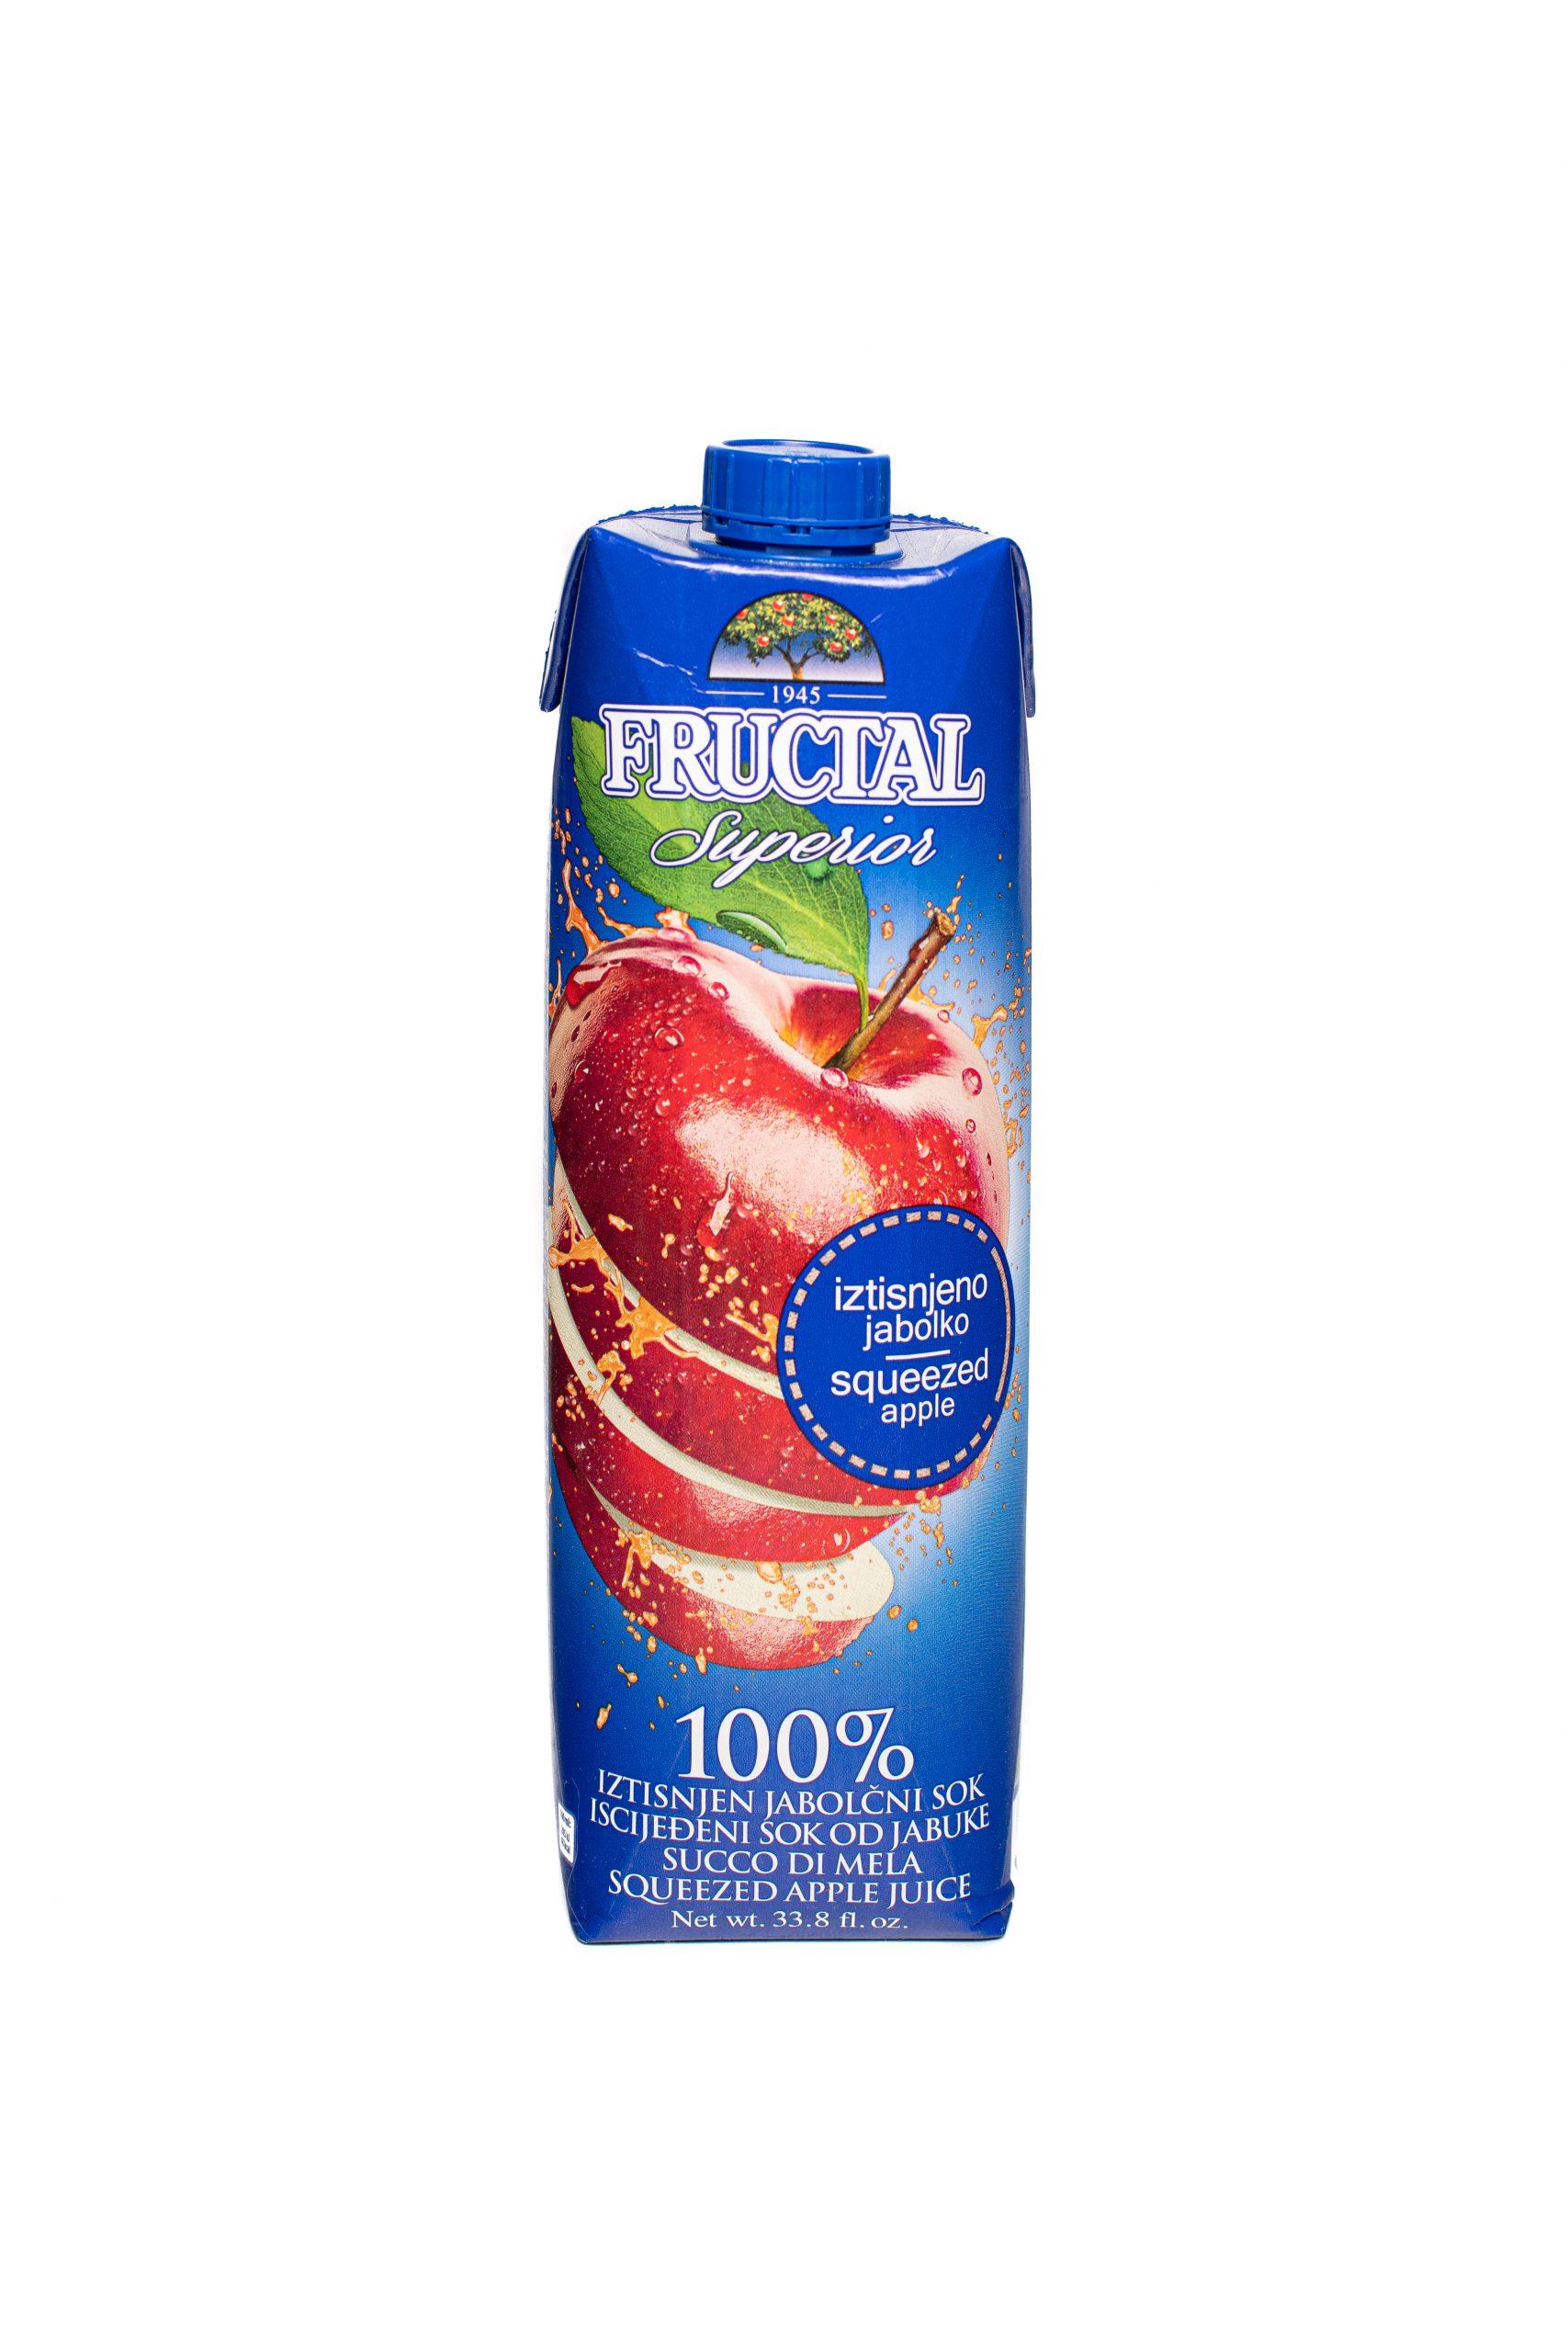 Fructal Superior | 1L | Apple